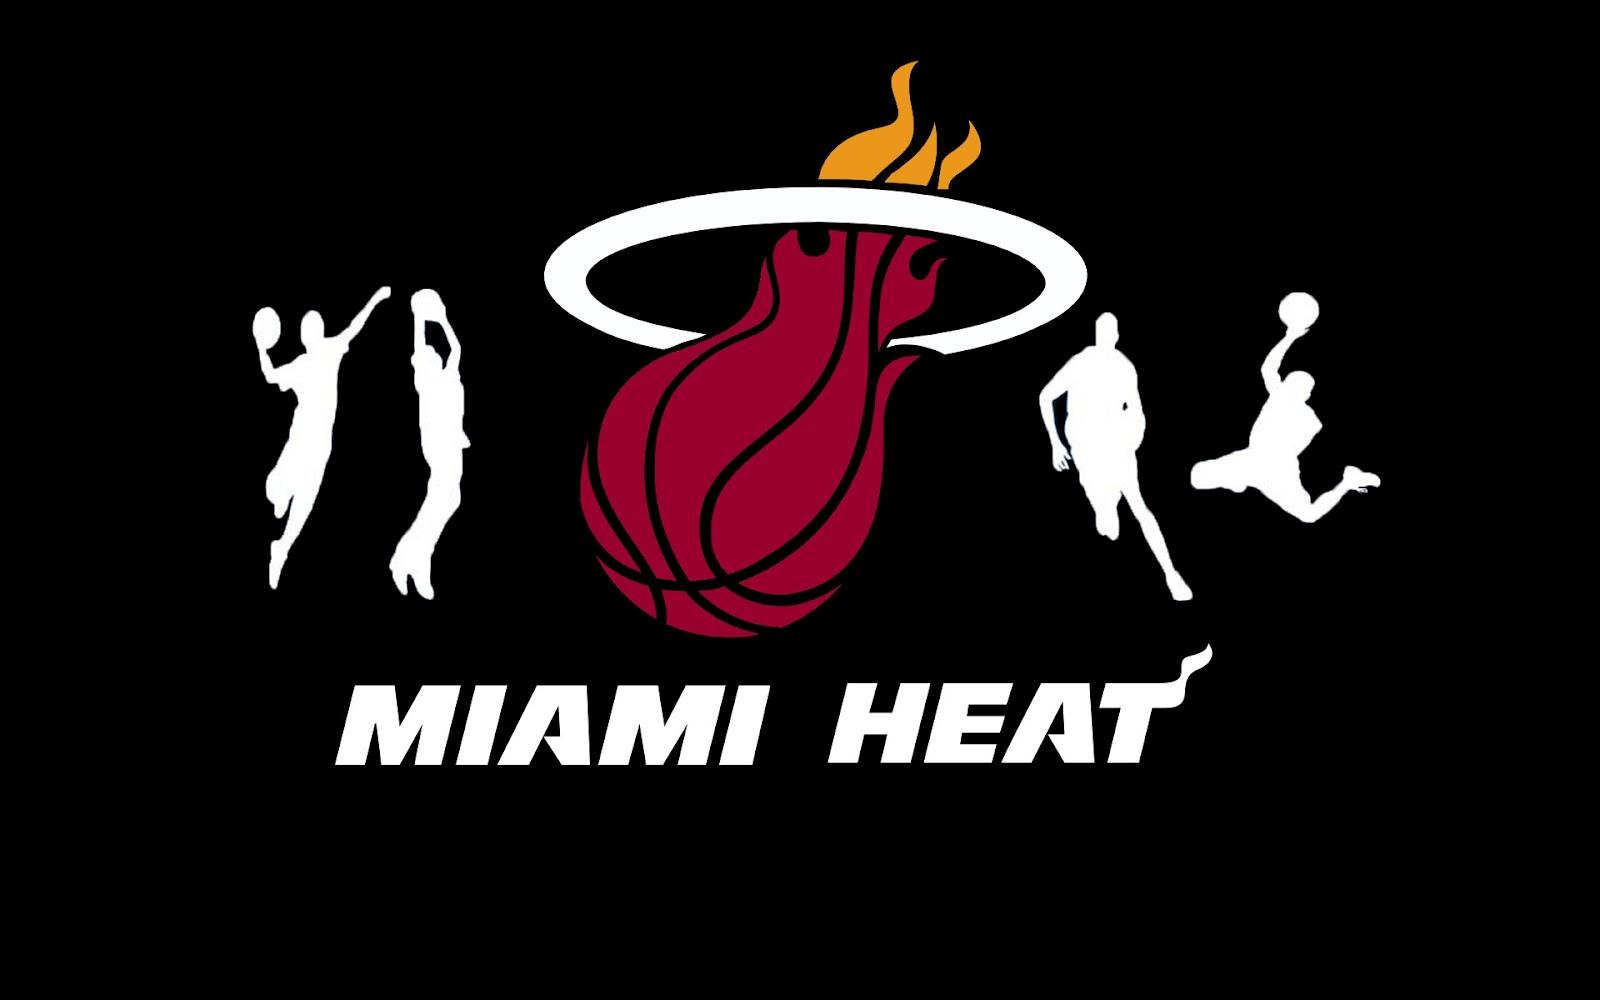 Nba Basketball Miami Heat Bedroom In: Wallpaper & Pictures